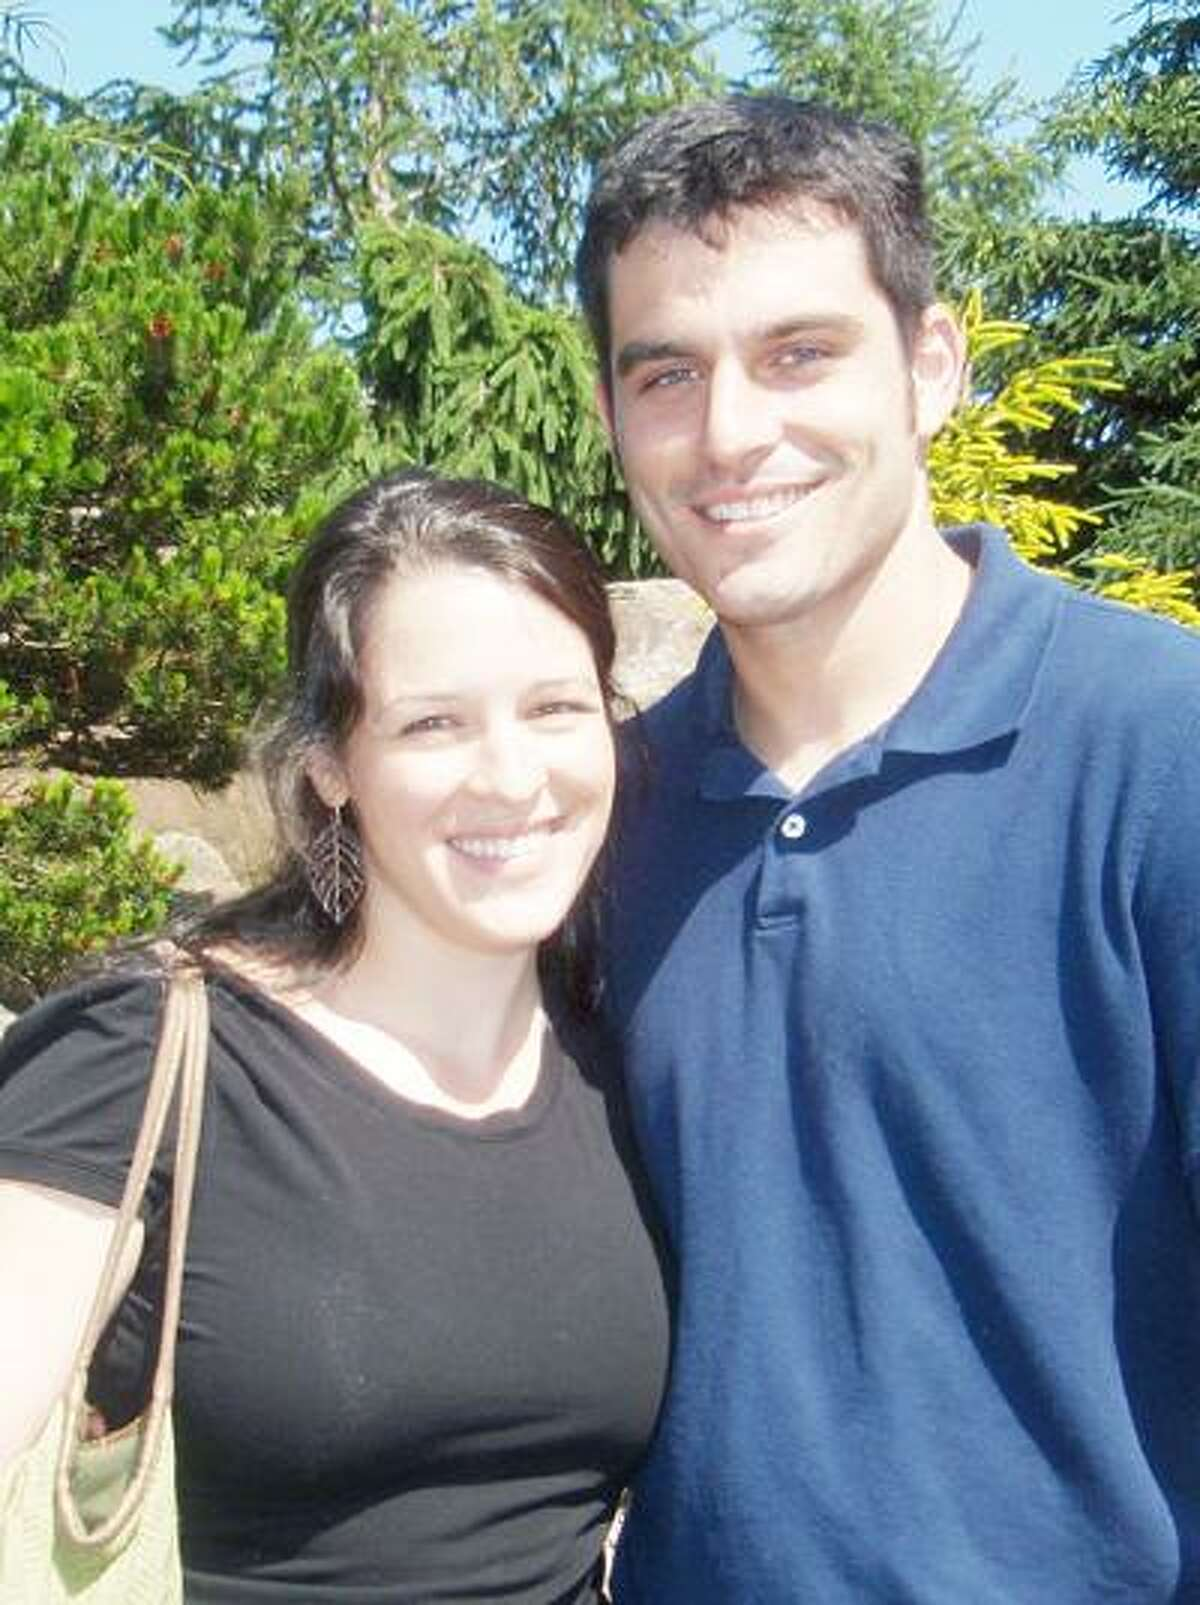 Meggan Blanchard and Andrew Meakin